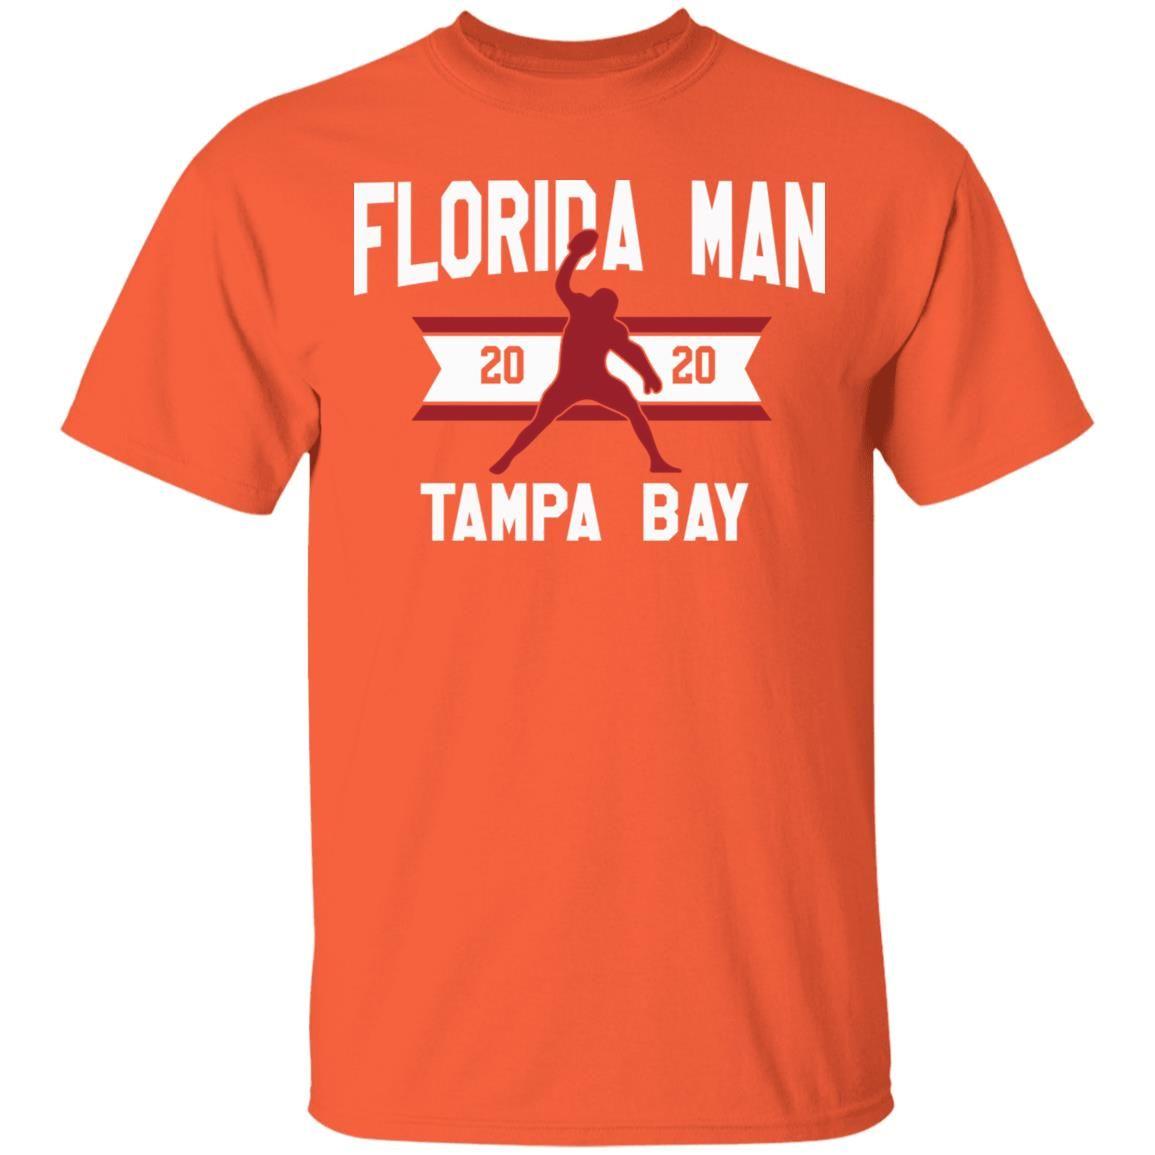 Forida man 2020 rob gronkowski tampa bay shirt horsetee